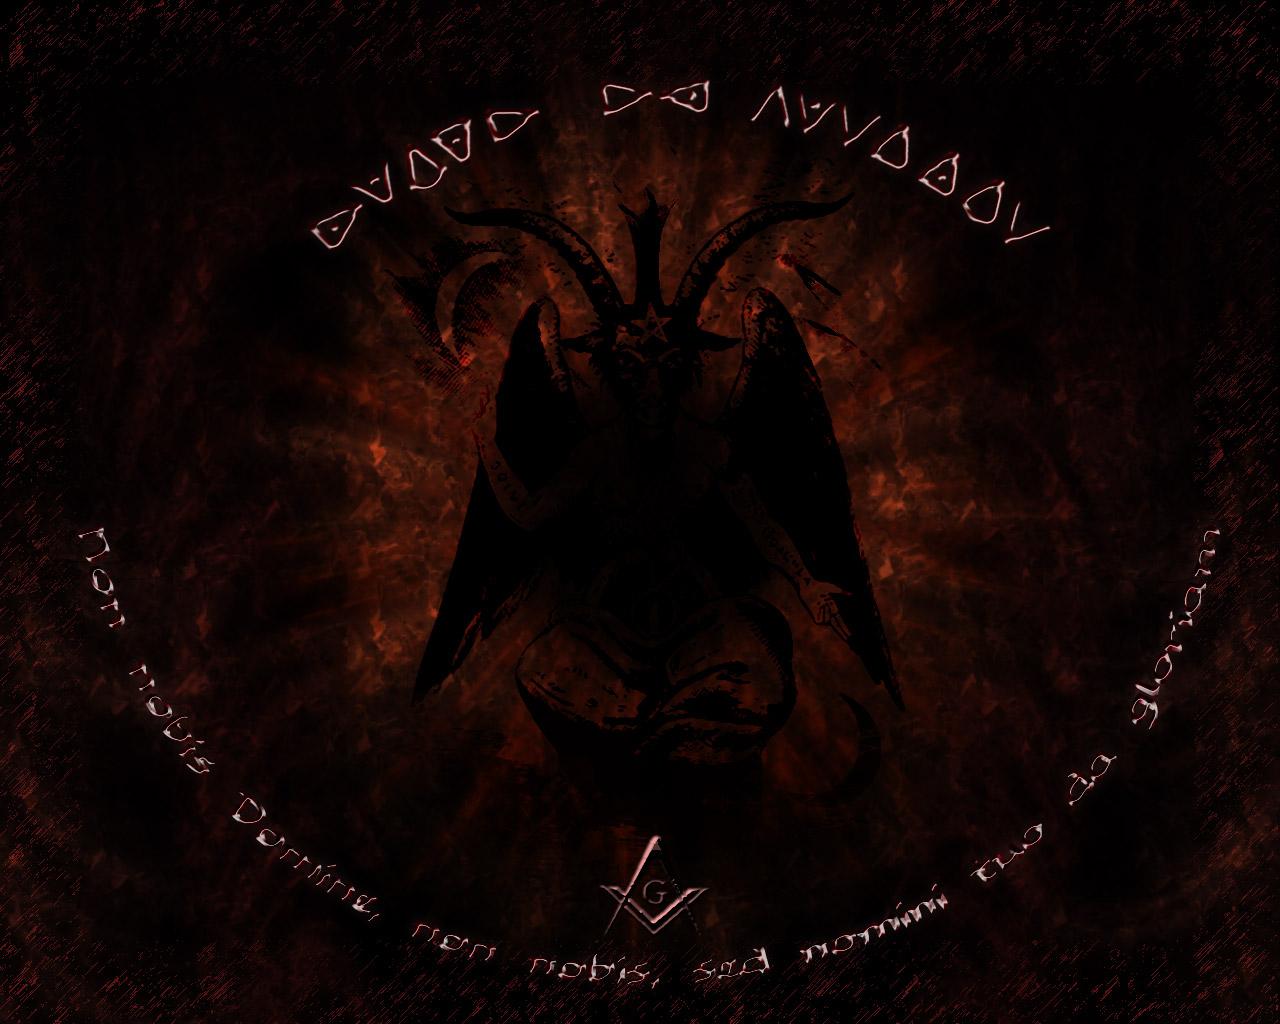 Download Dark Occult Wallpaper 1280x1024 Wallpoper 223592 1280x1024